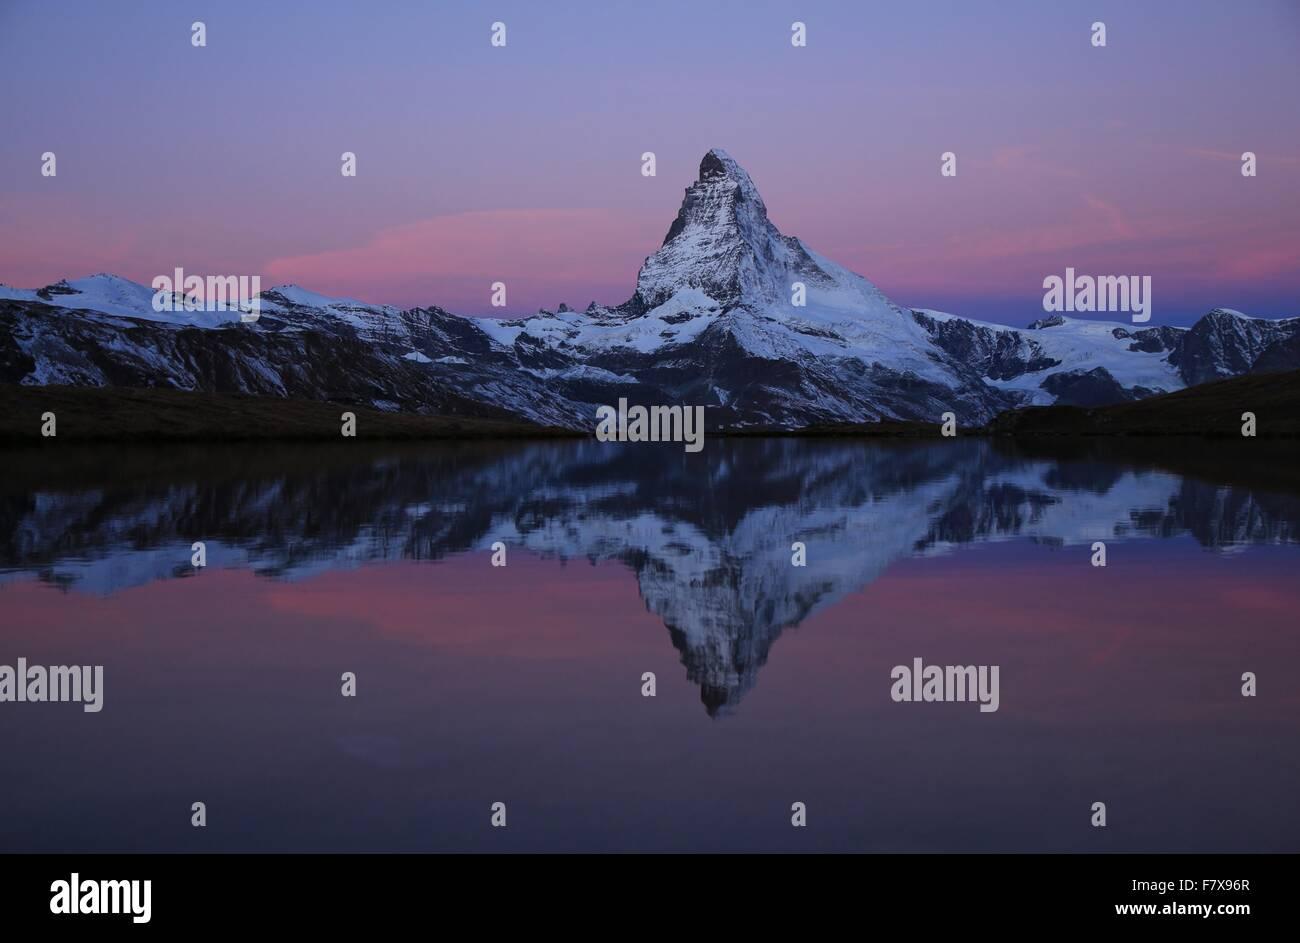 Pink morning sky over the Matterhorn Stock Photo